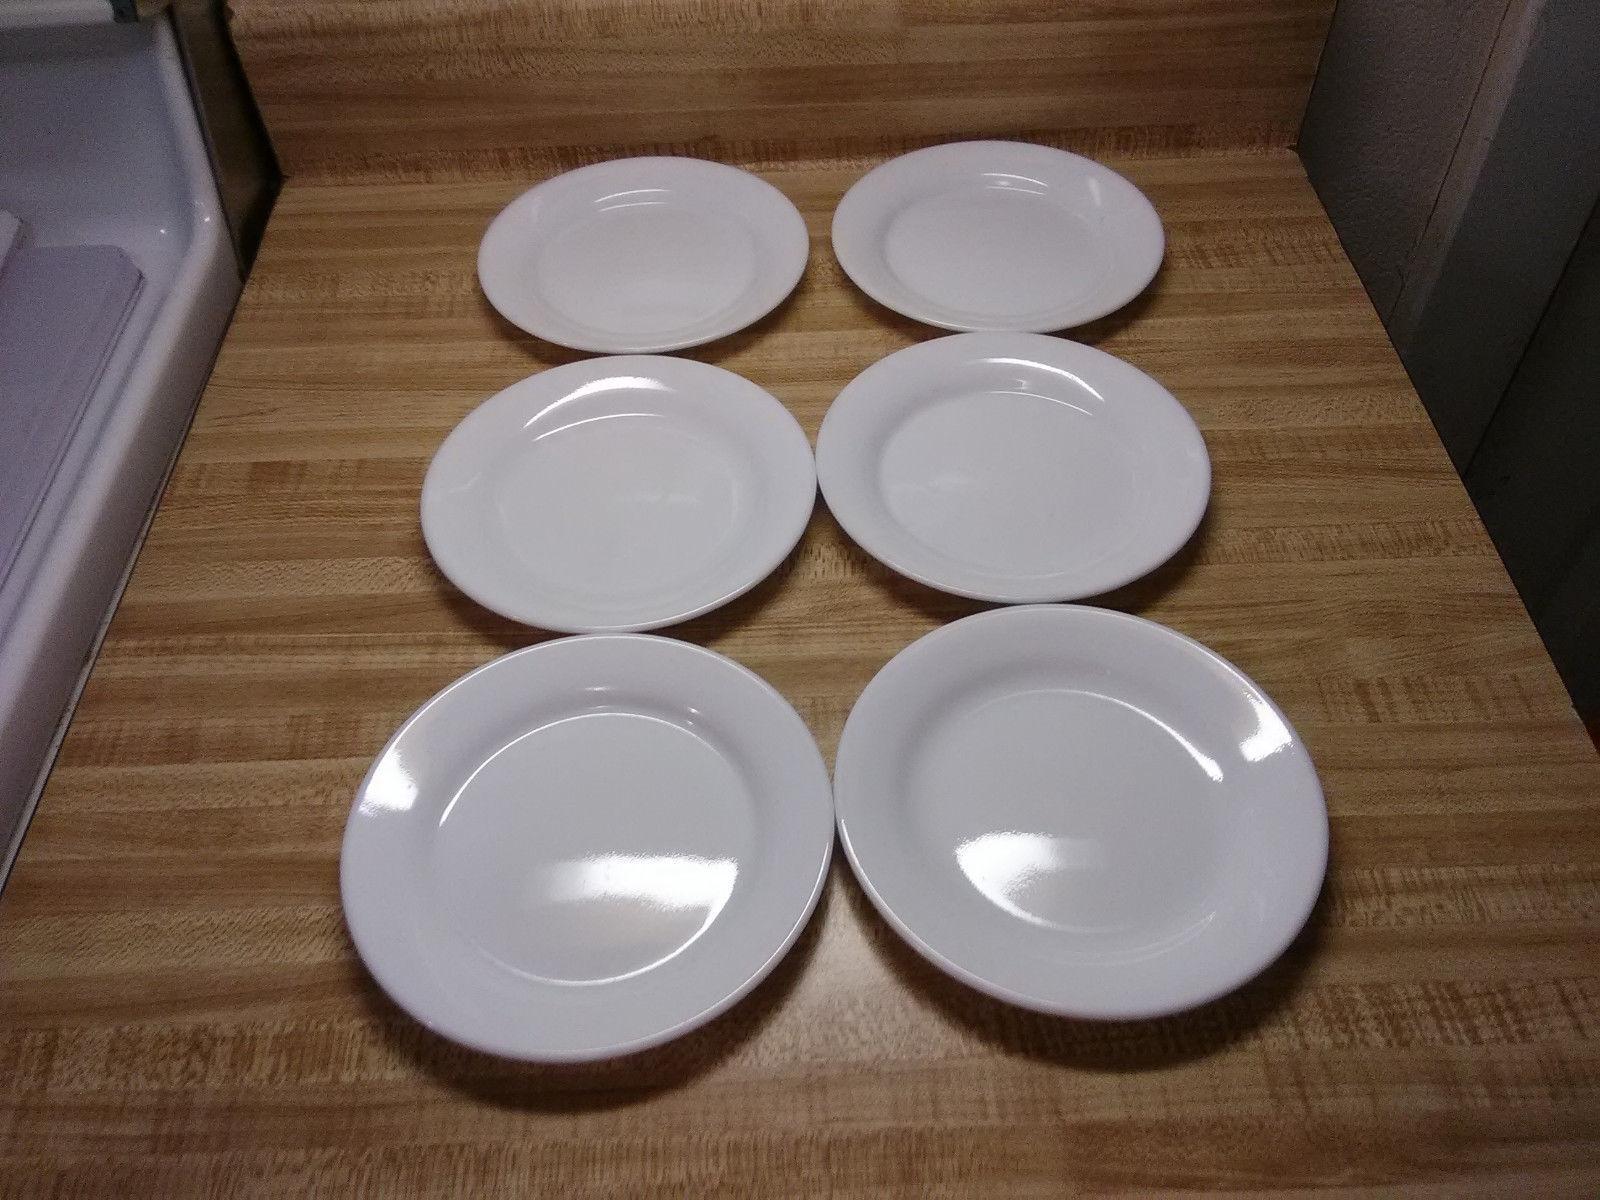 white comcor tableware by corning & white comcor tableware by corning and 50 similar items